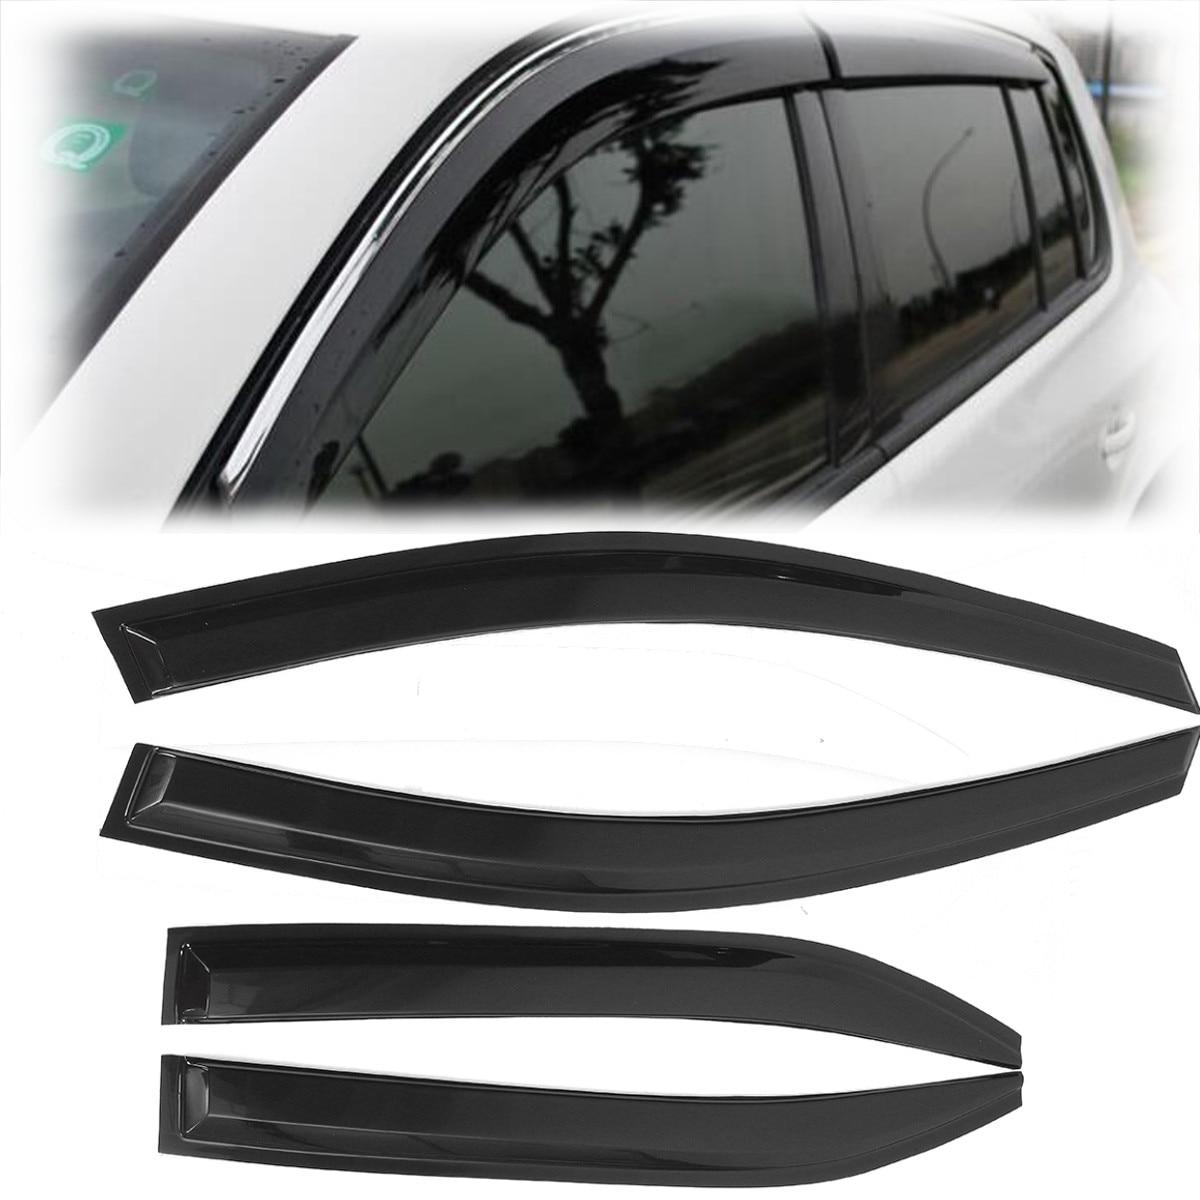 4PCS Car Window Visor Shade Vent Rain Deflector Cover For Toyota Camry 2007 2008 2009 2010 2011